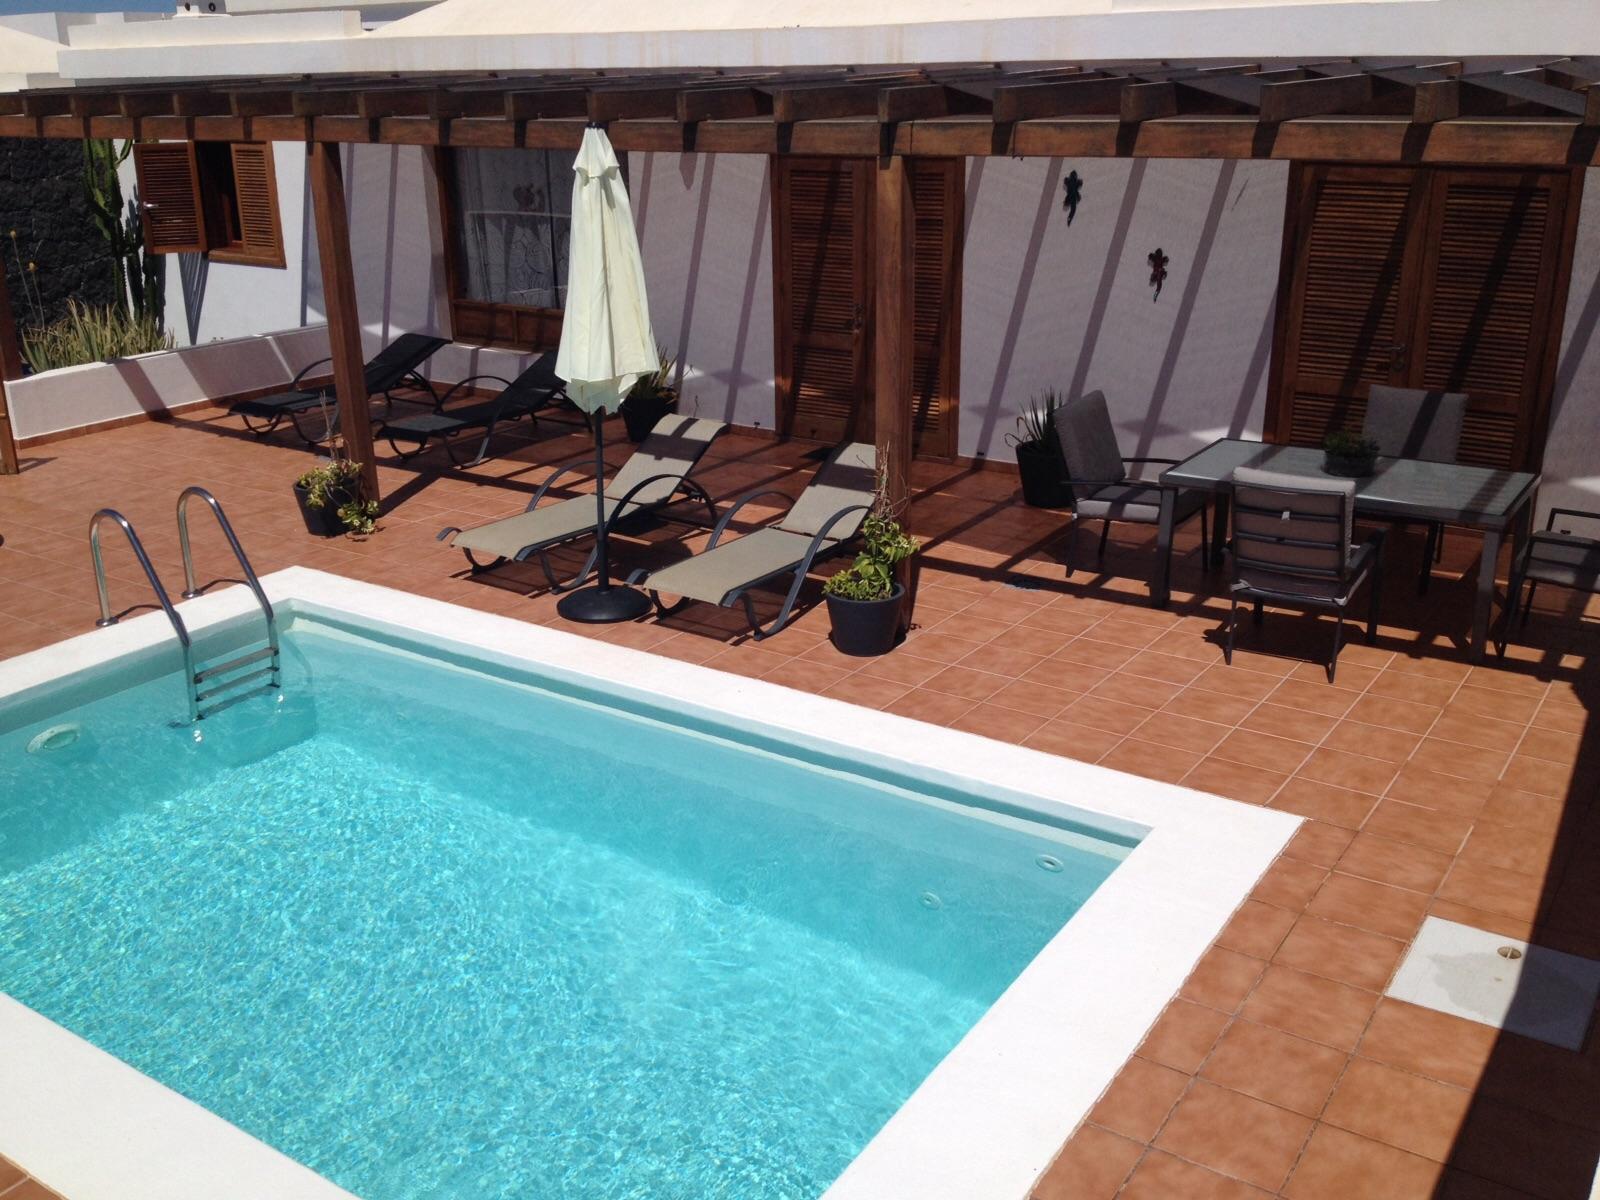 LVC247306 Villa with 3 bedrooms in Playa Blanca